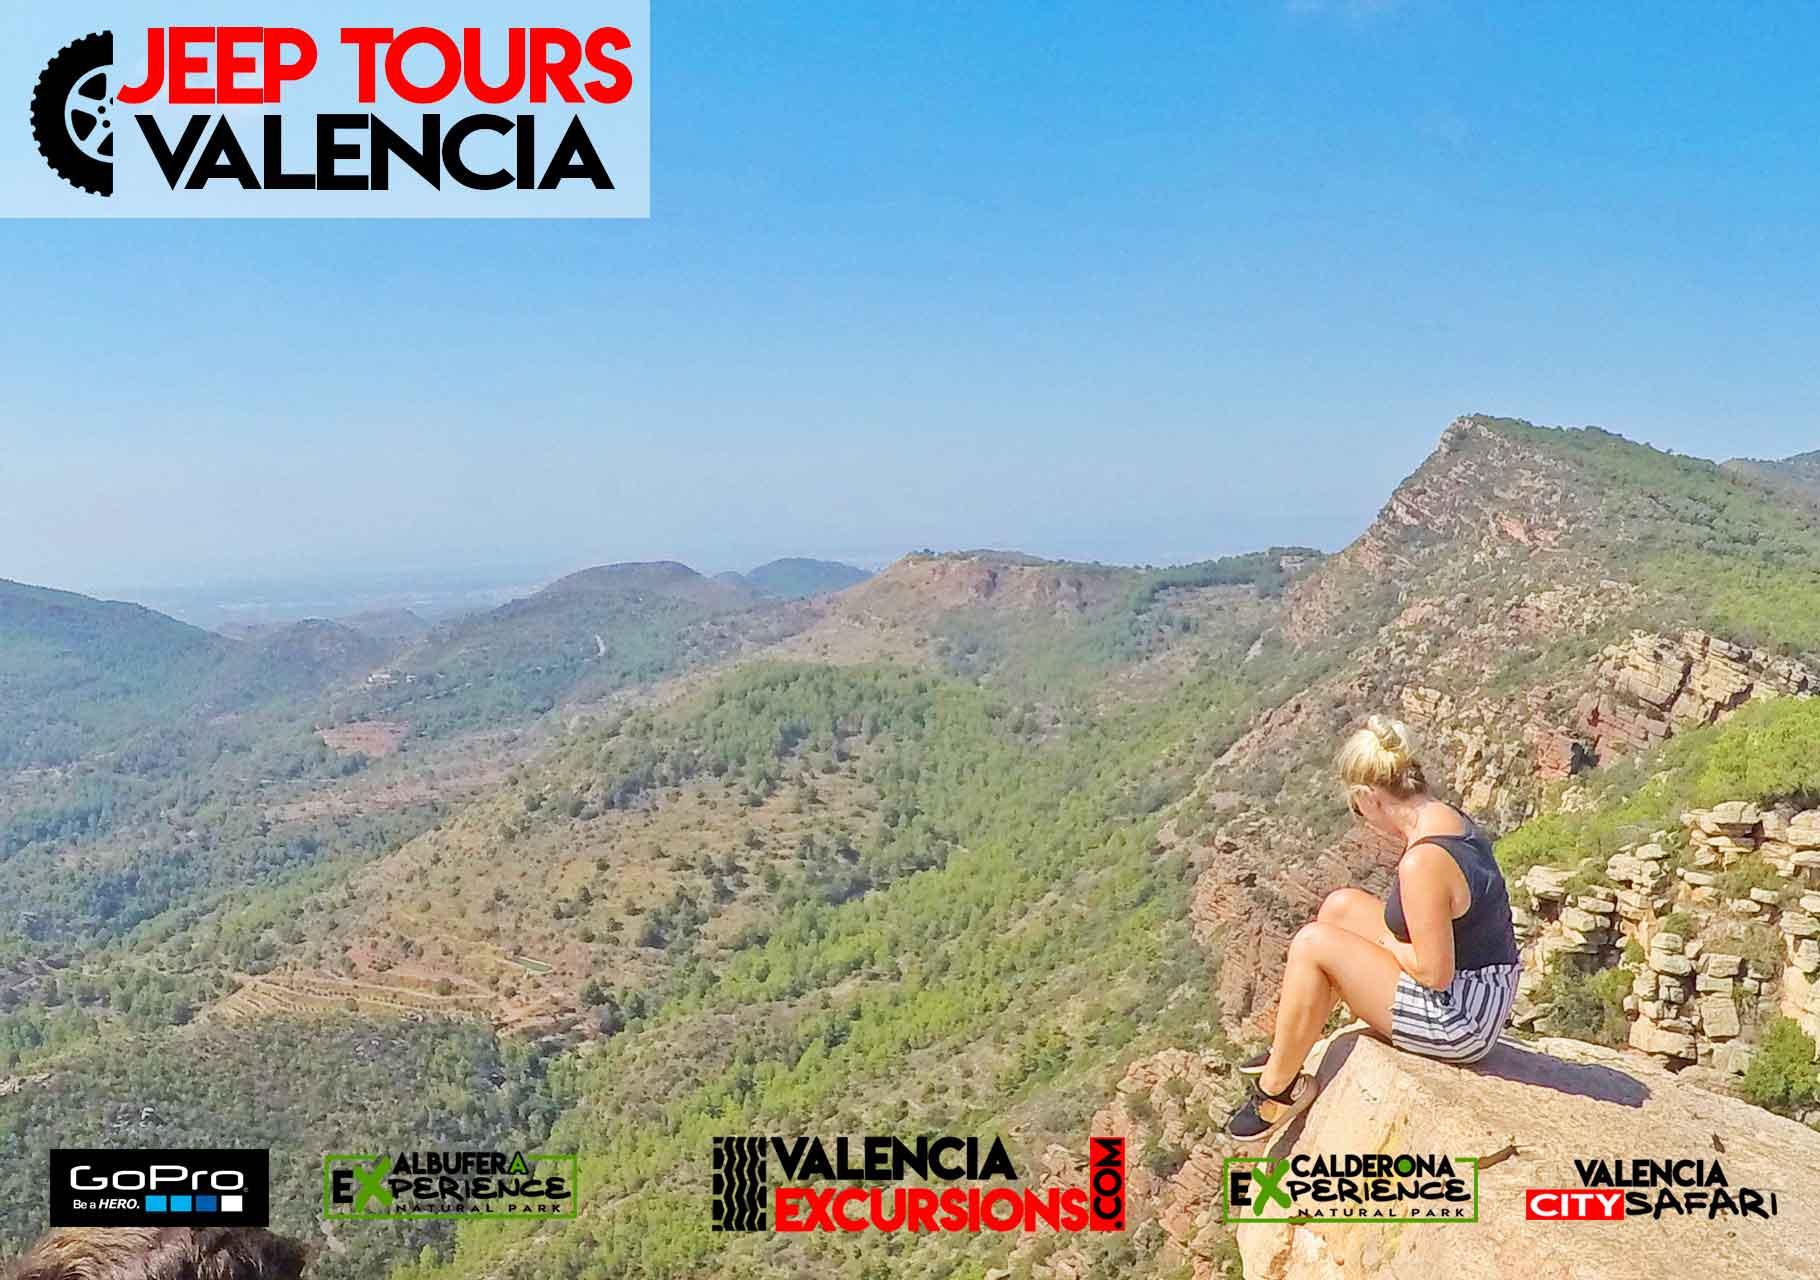 Halbtages Tour Valencia Abenteuer in den Bergen Calderona Natur Park. Fun Tour Valencia